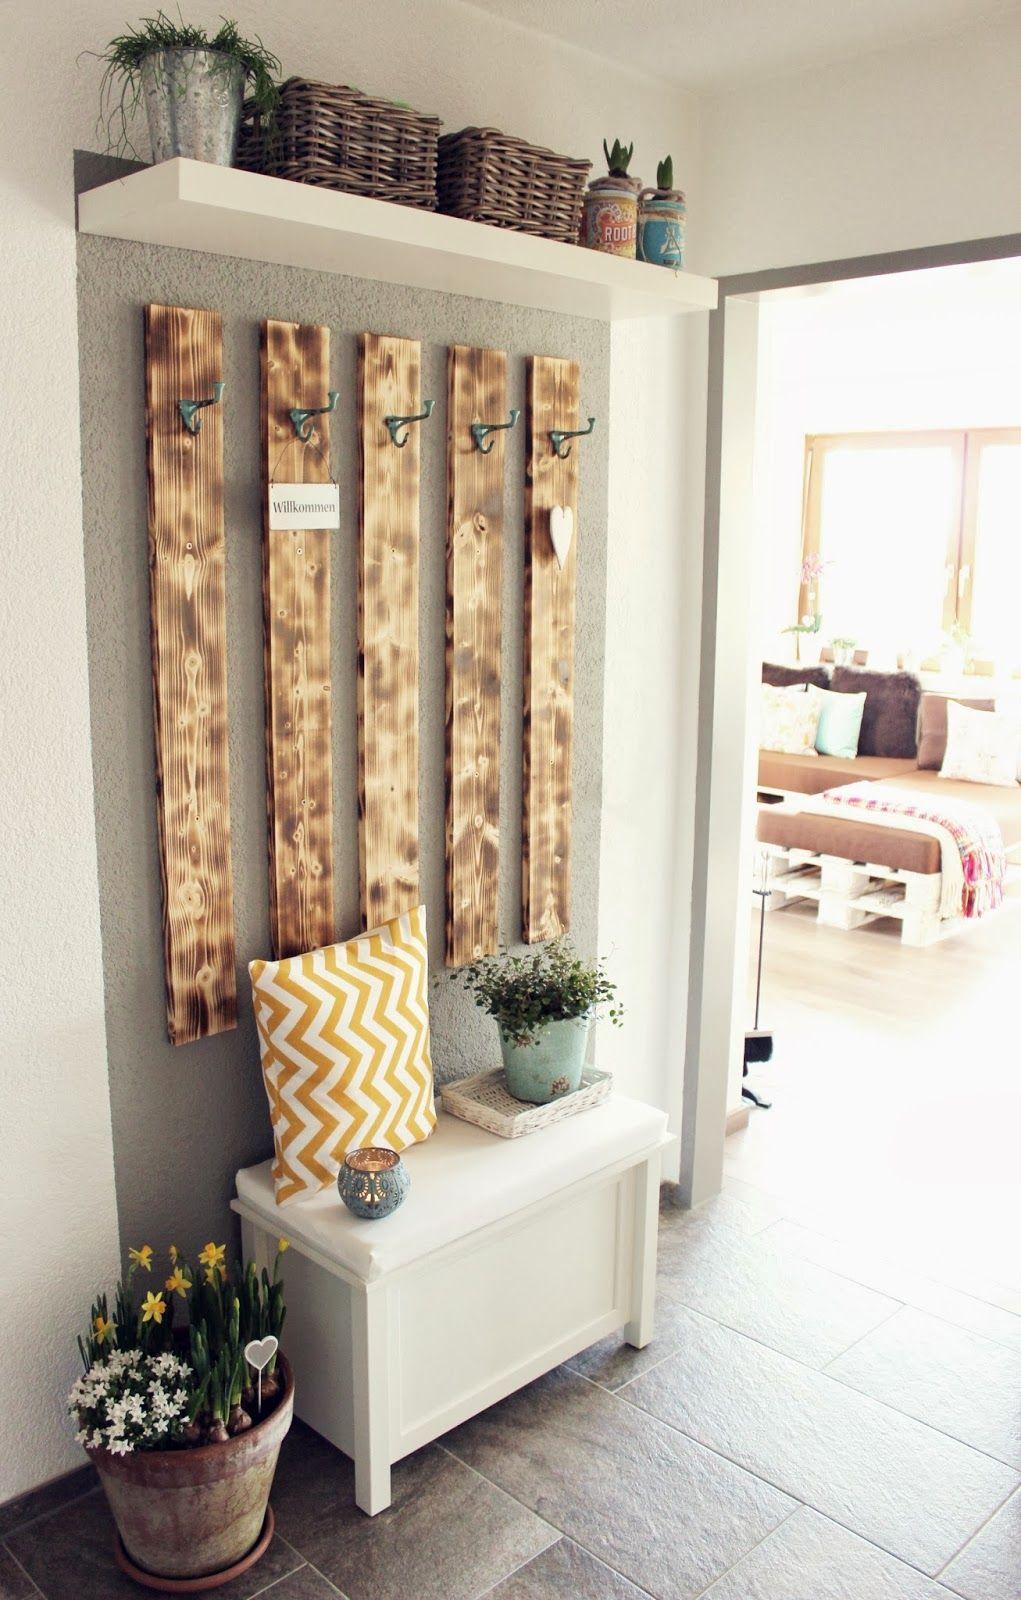 diy garderobe s 39 bastelkistle. Black Bedroom Furniture Sets. Home Design Ideas